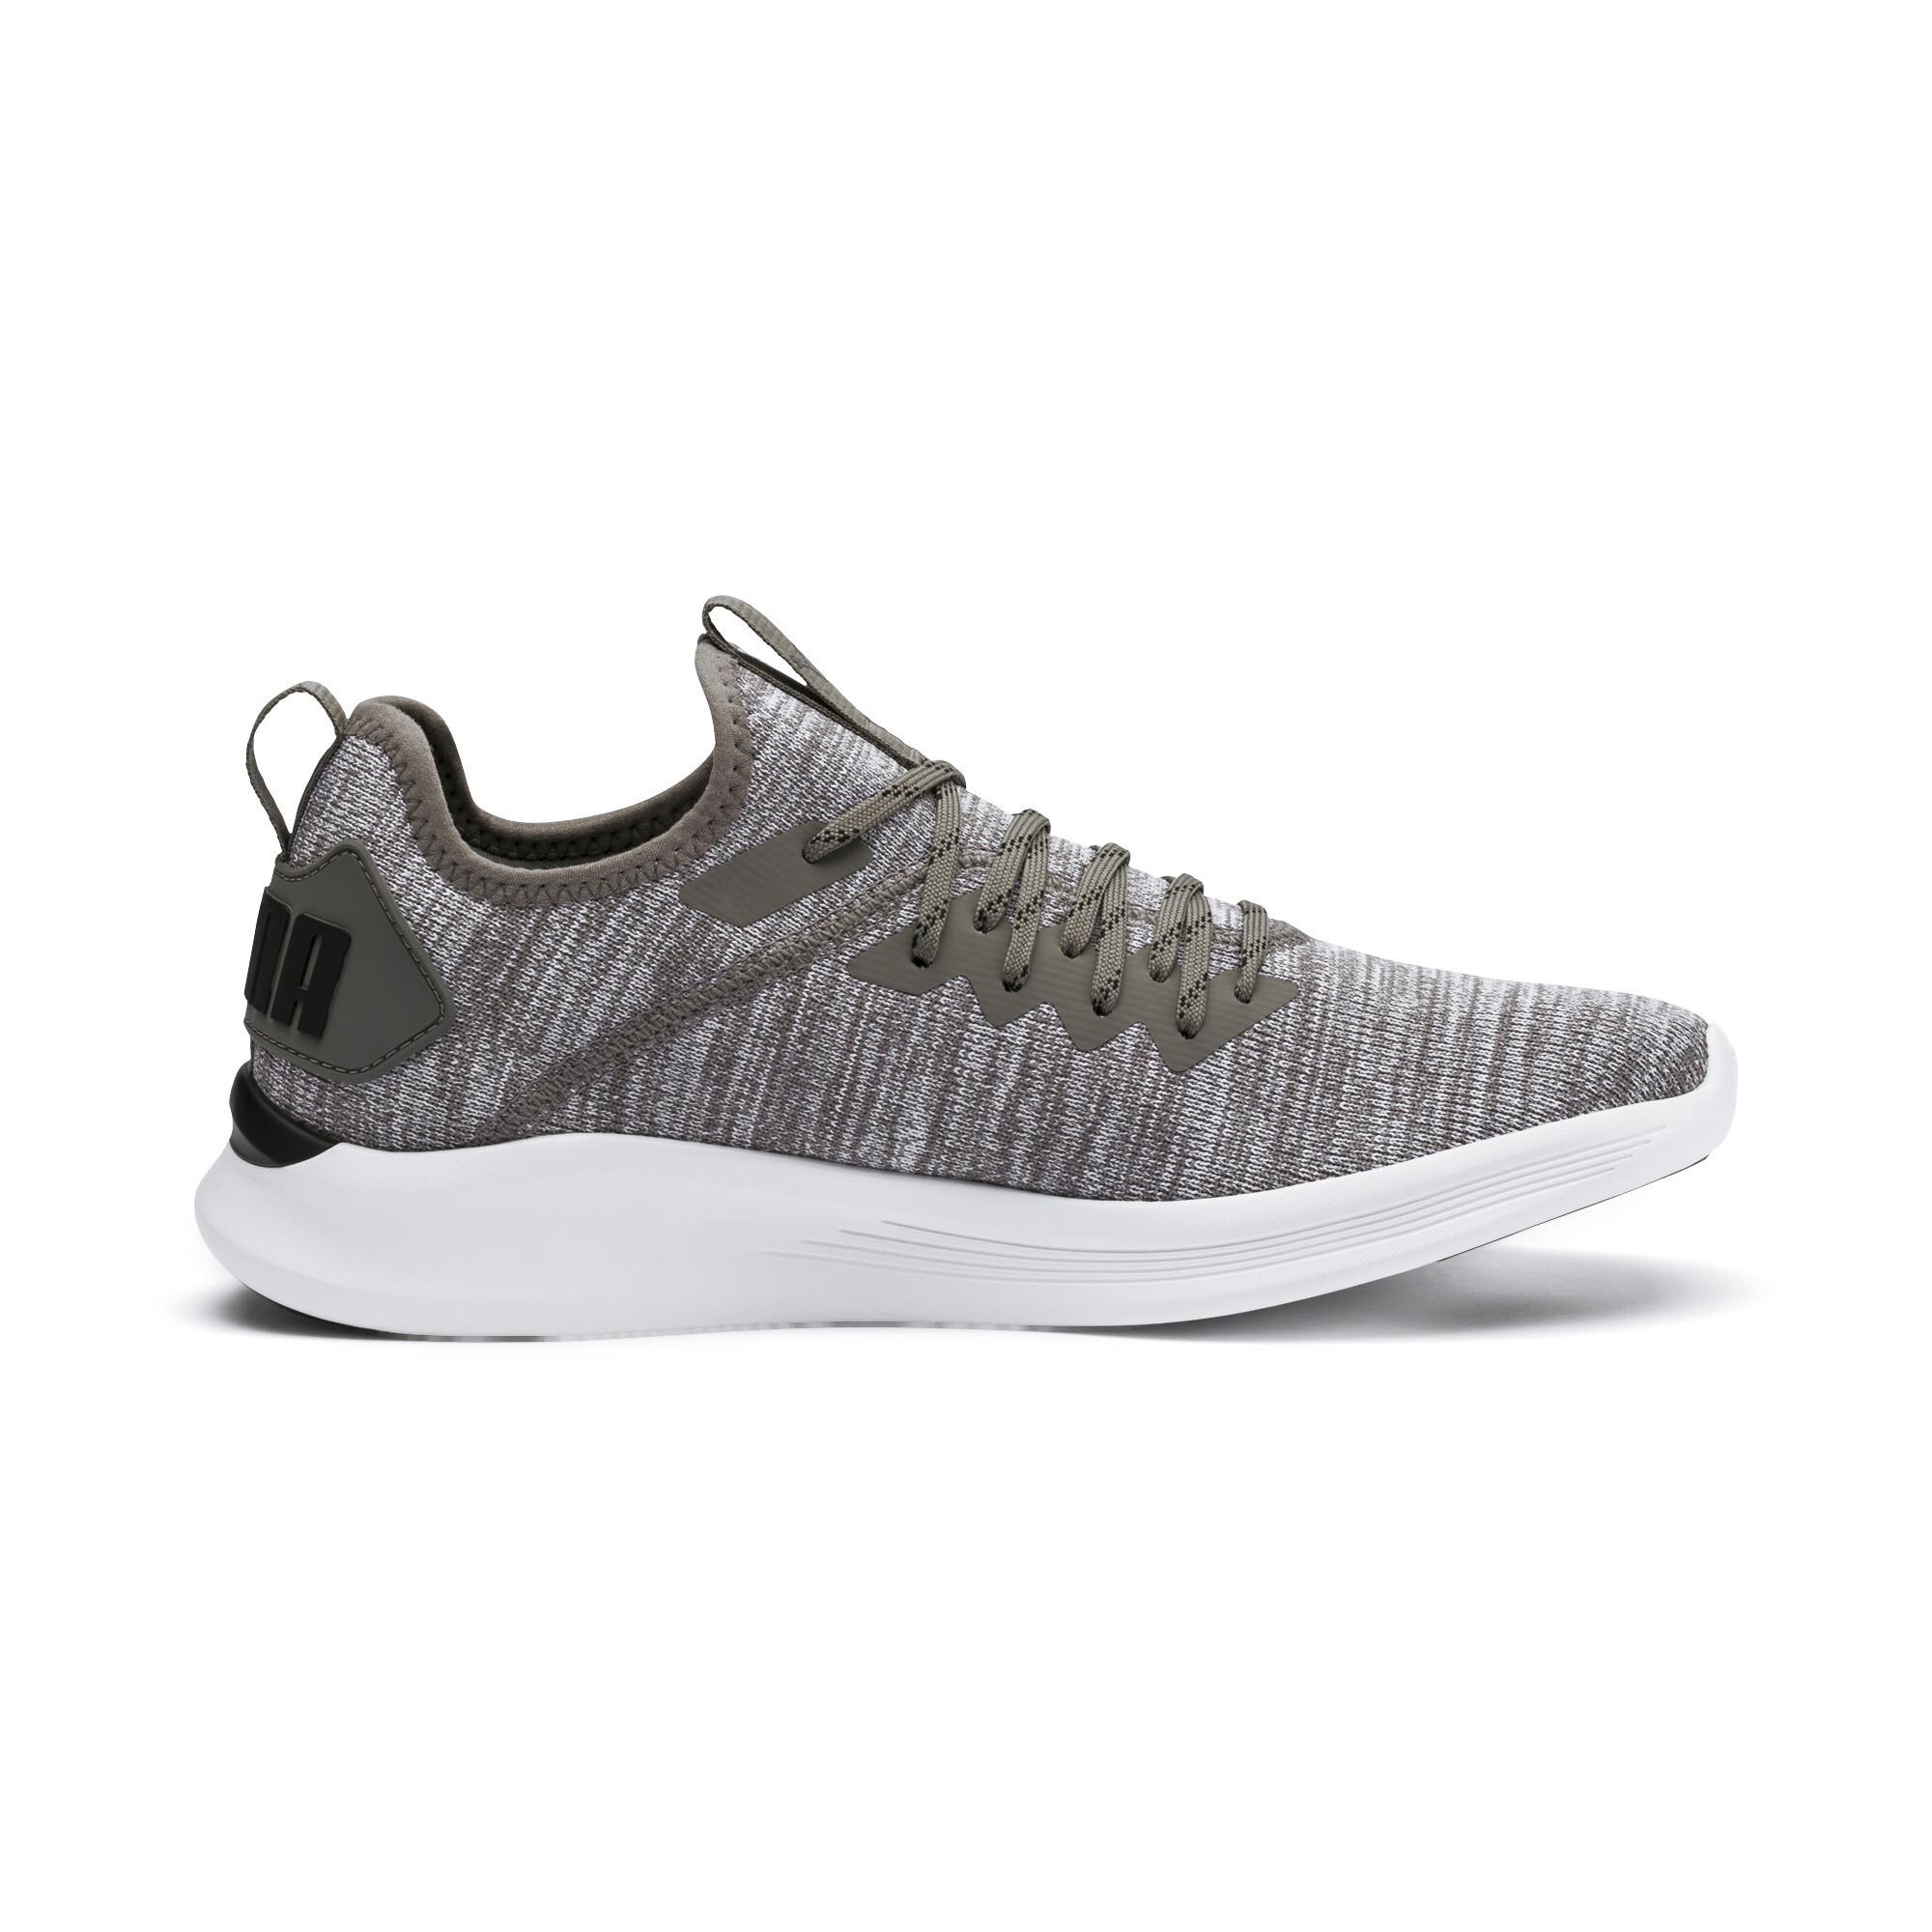 Image Puma IGNITE Flash evoKNIT Men's Training Shoes #6